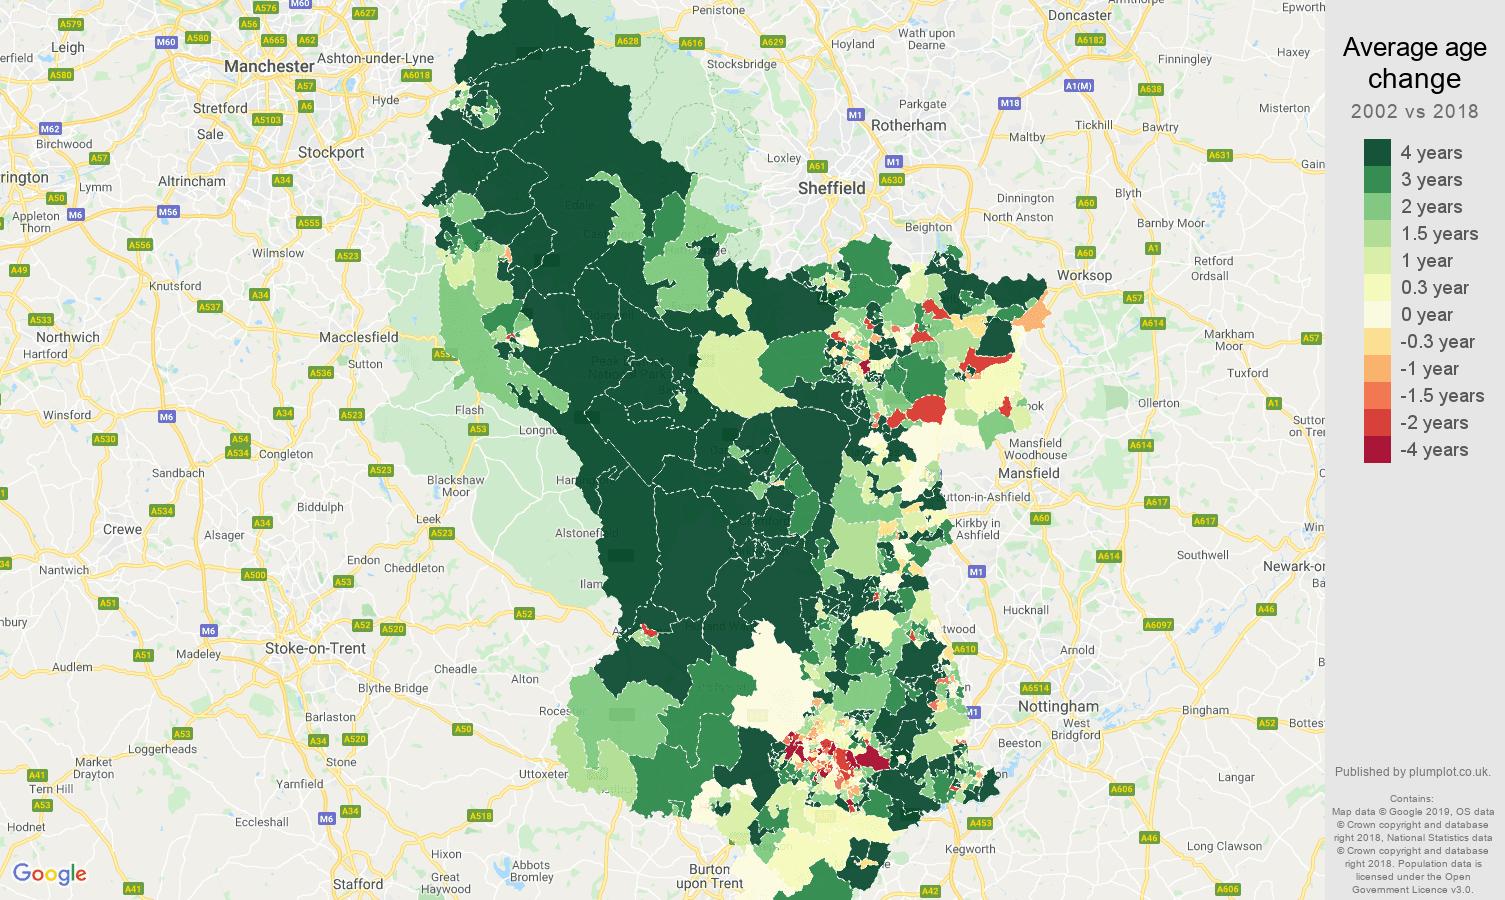 Derbyshire average age change map